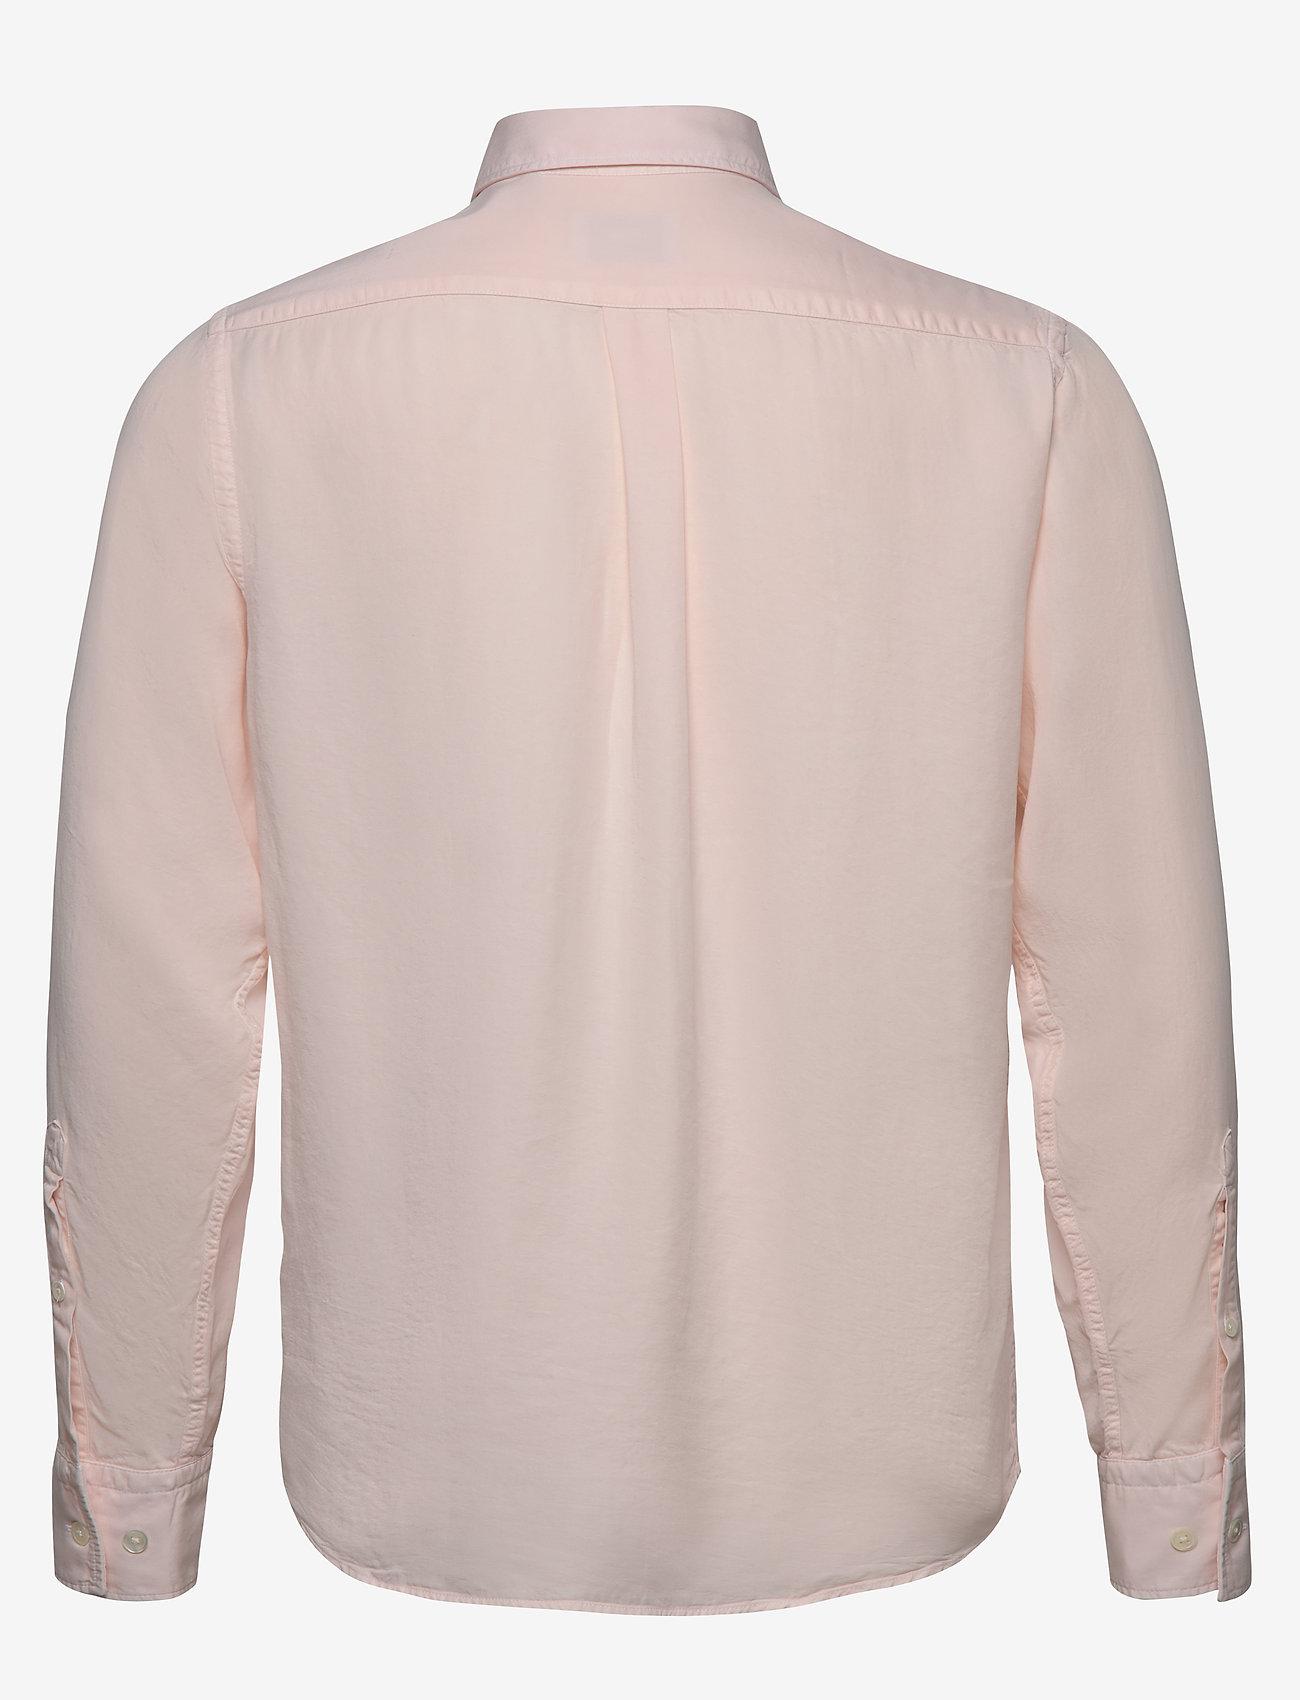 NN07 - Levon Shirt 5969 - casual - beverly pink - 1